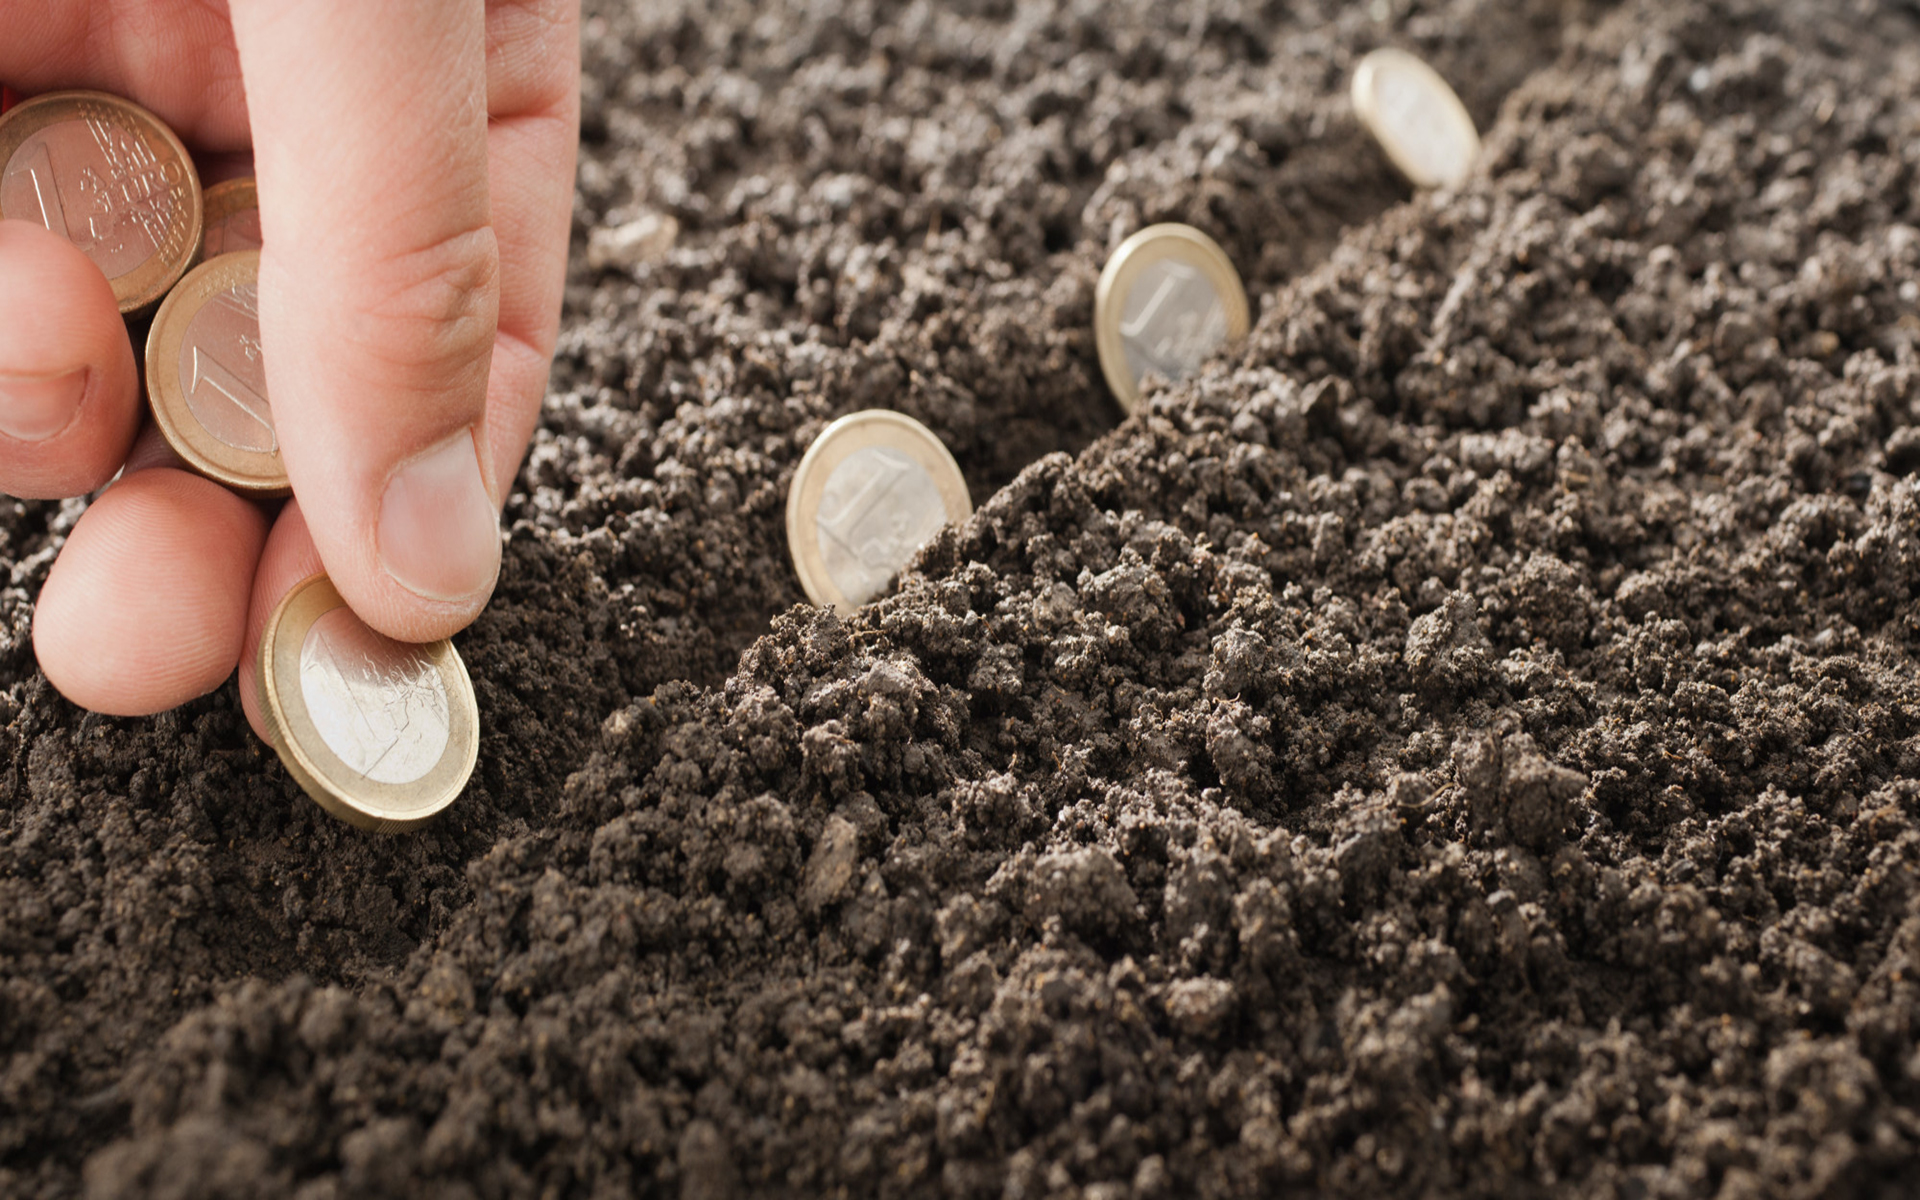 Man planting Euro coins in soil